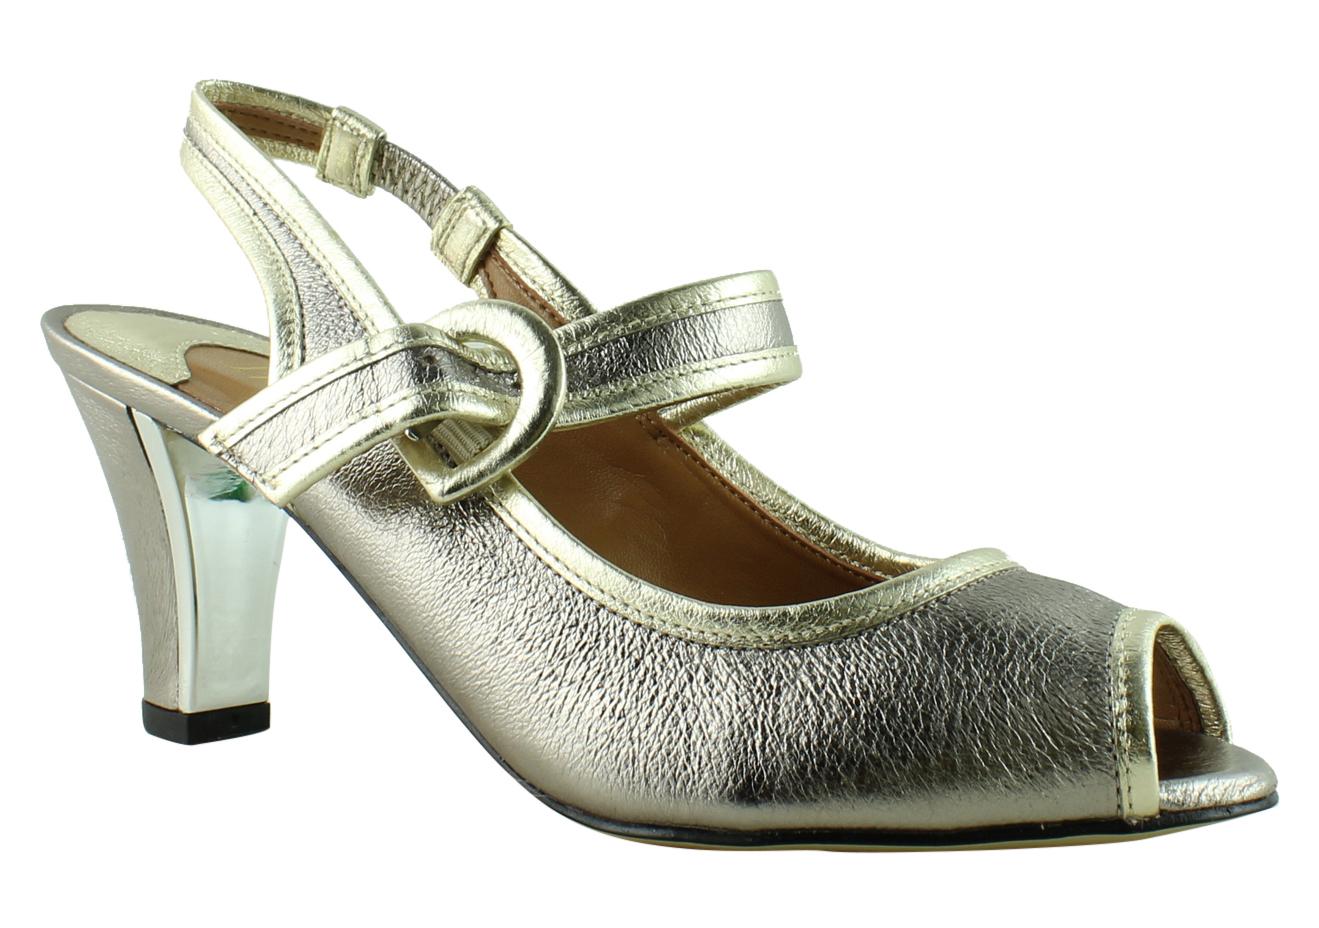 New J. Renee Womens Gold Ankle Strap Heels Size 7.5 Narrow (AA, N) by J. Renee